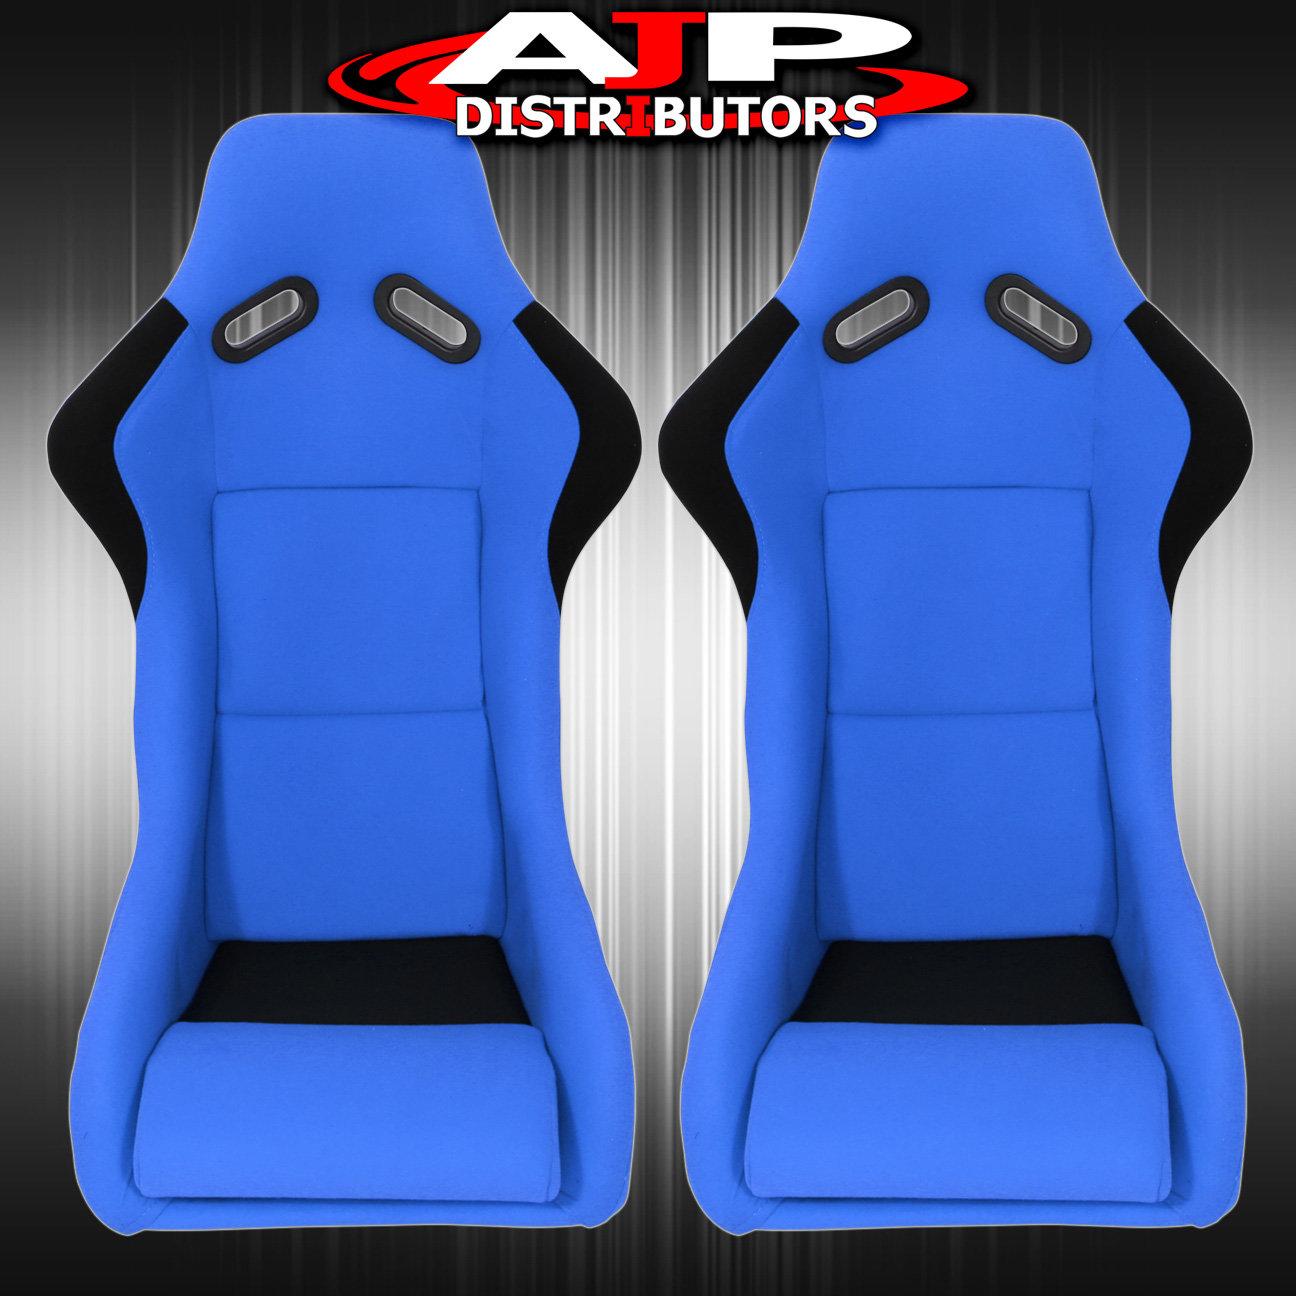 2X Jdm Firm Hold Track Style Full Cloth Racing Bucket Seats W// Slider Rails Blue